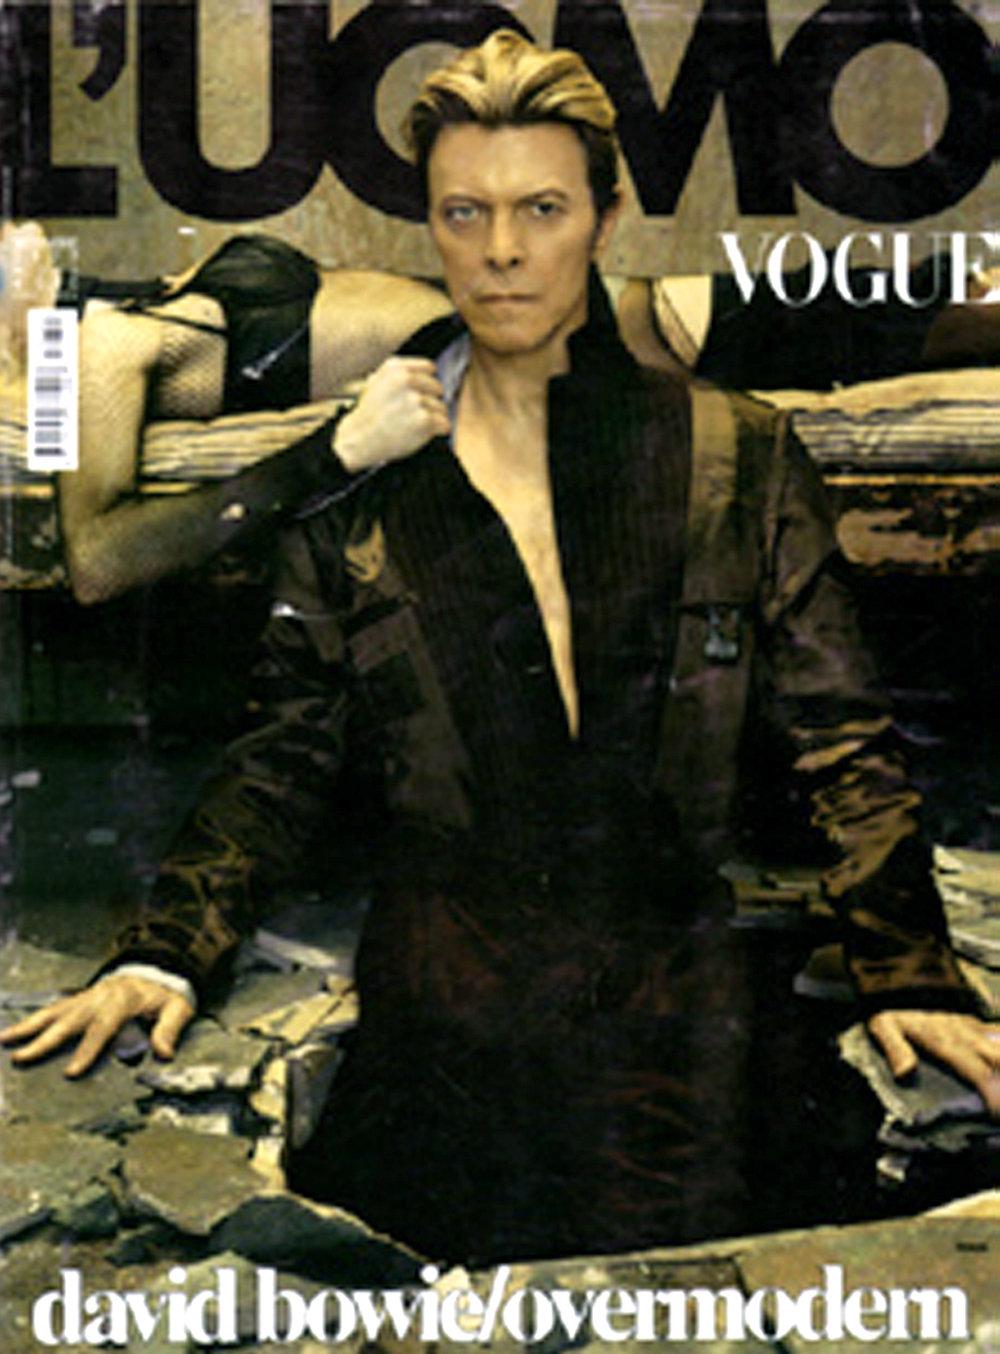 BOWIE. L'UOMO VOGUE BY STEVEN KLEIN. COVER.jpg